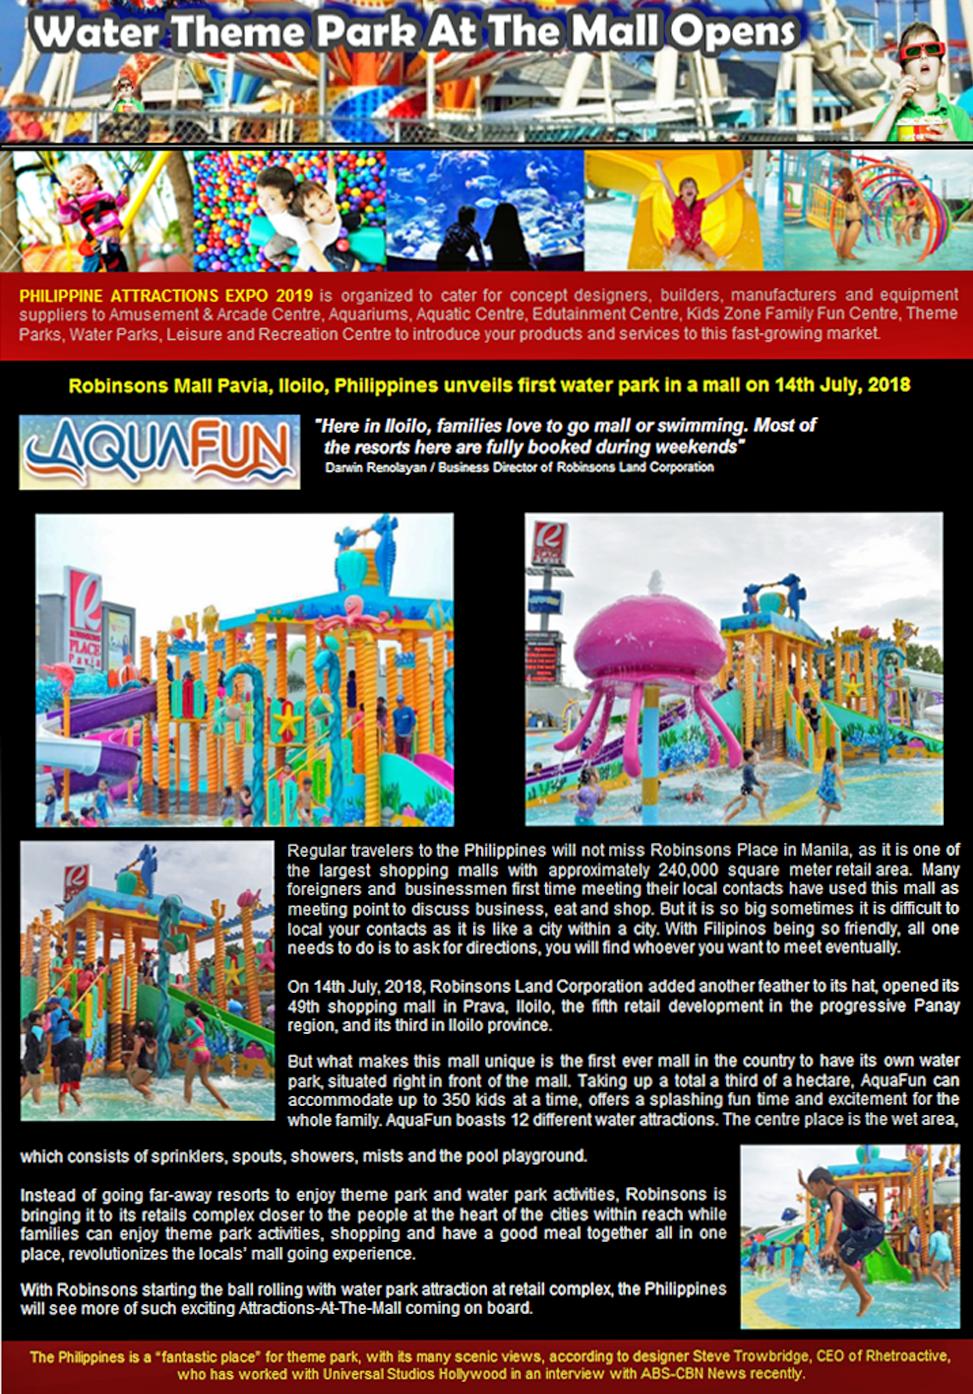 NR3 - PAExpo2019 News Release 3 (AquaFun